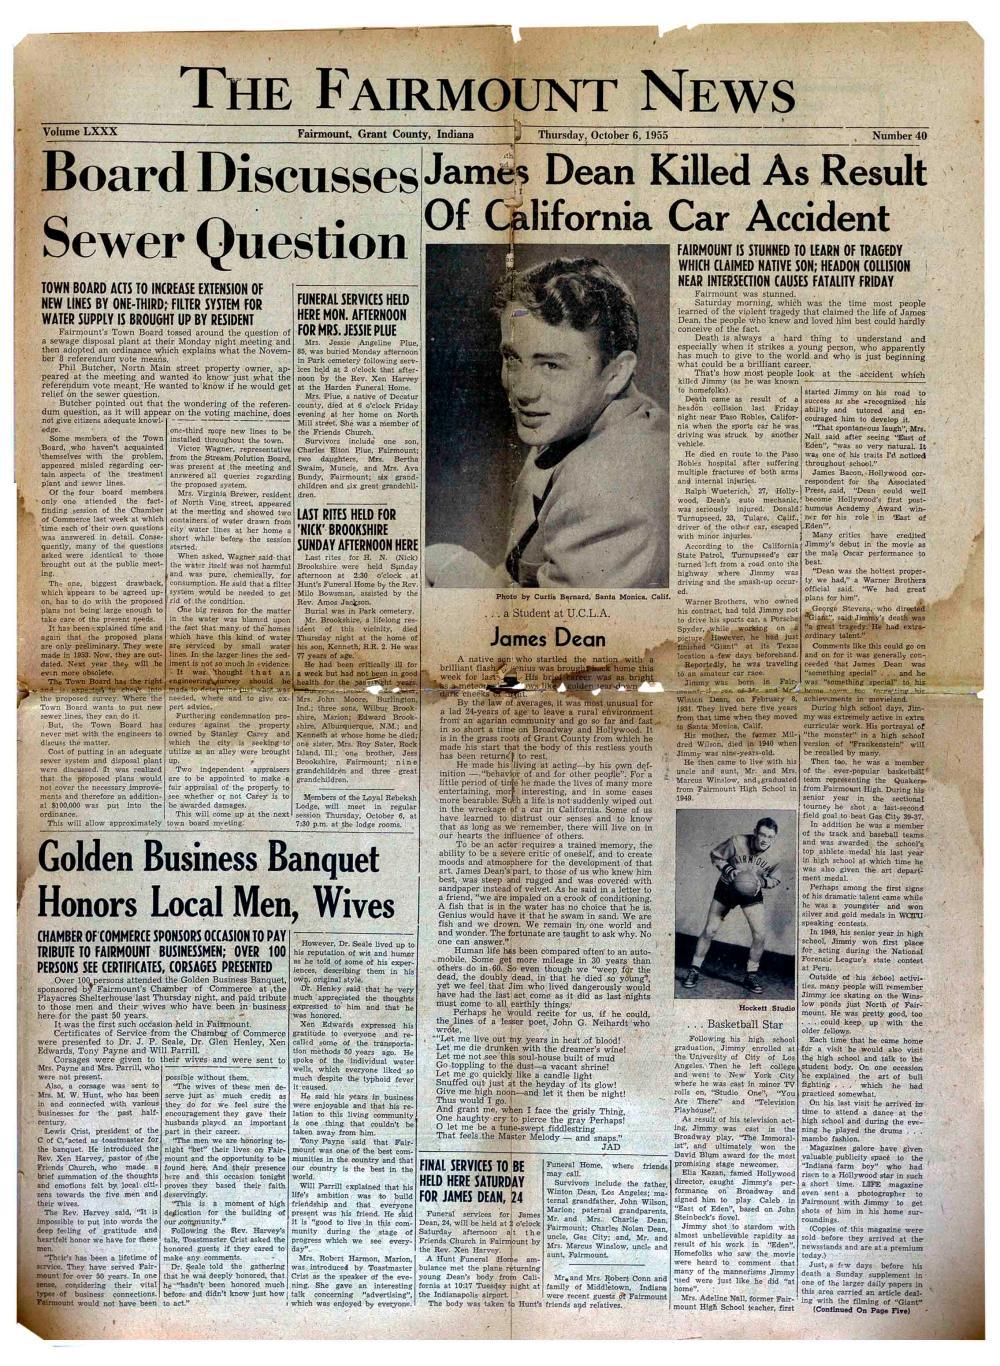 James Dean's Hometown Newspaper Announcing His Death